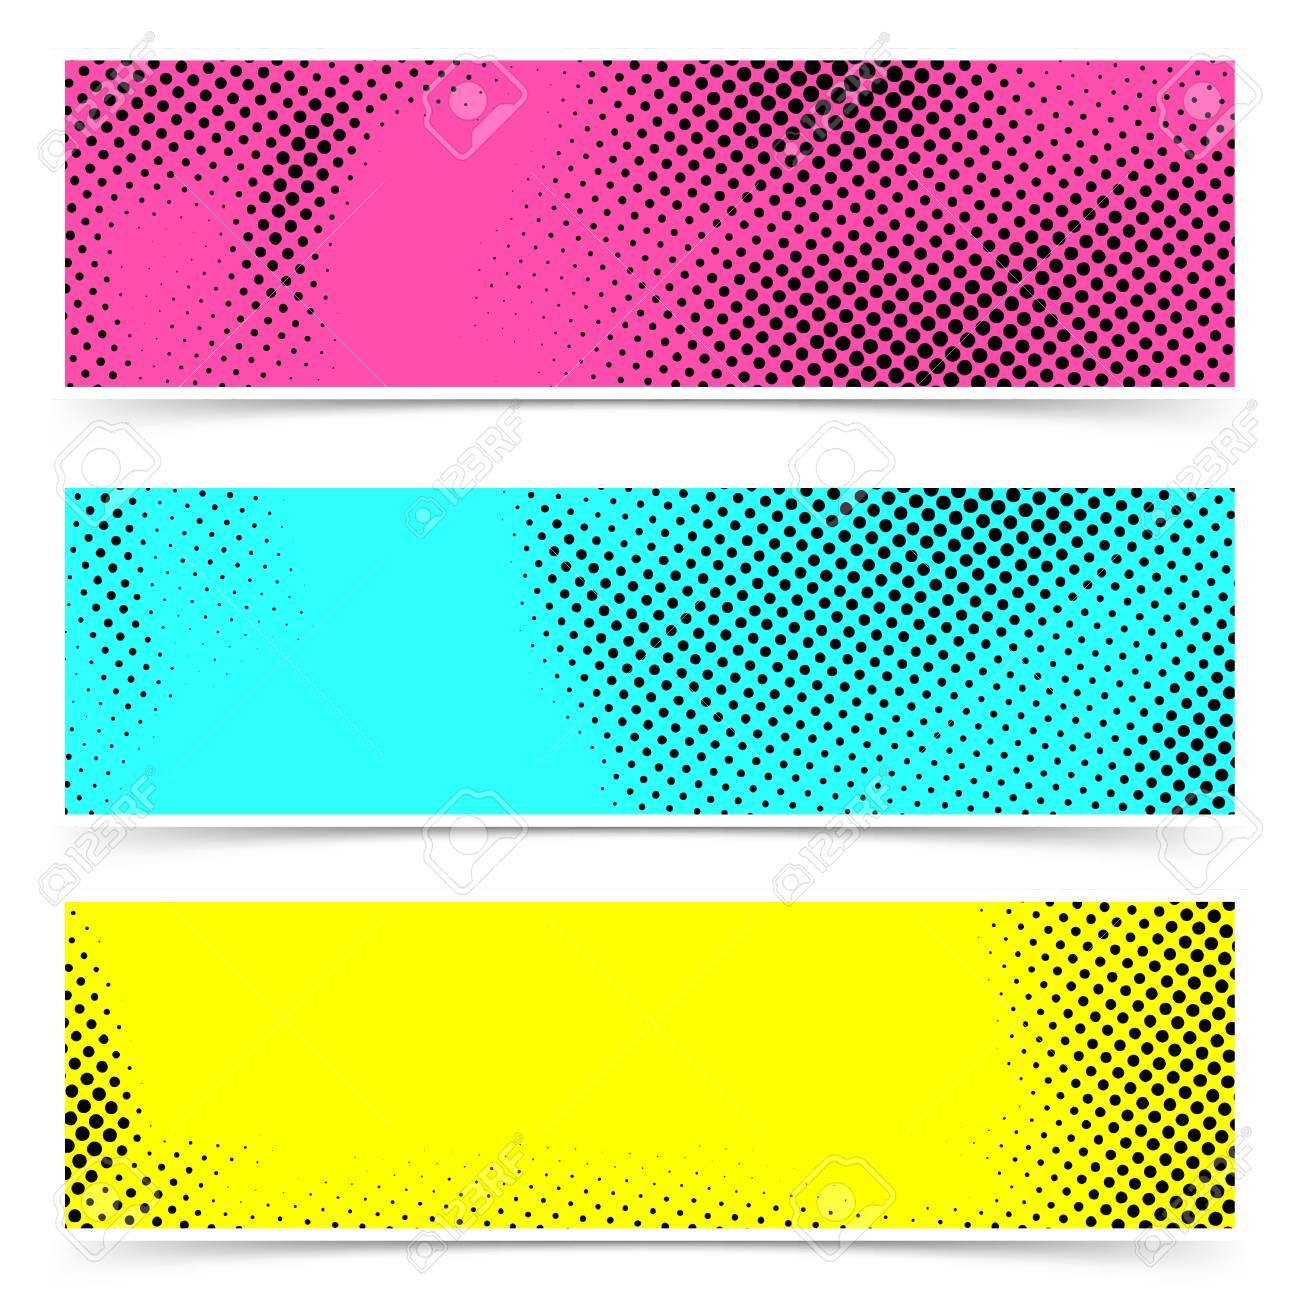 6e1d87d79ee5 Colorful dotted retro grain pop art comic style. Stock Vector - 88366286